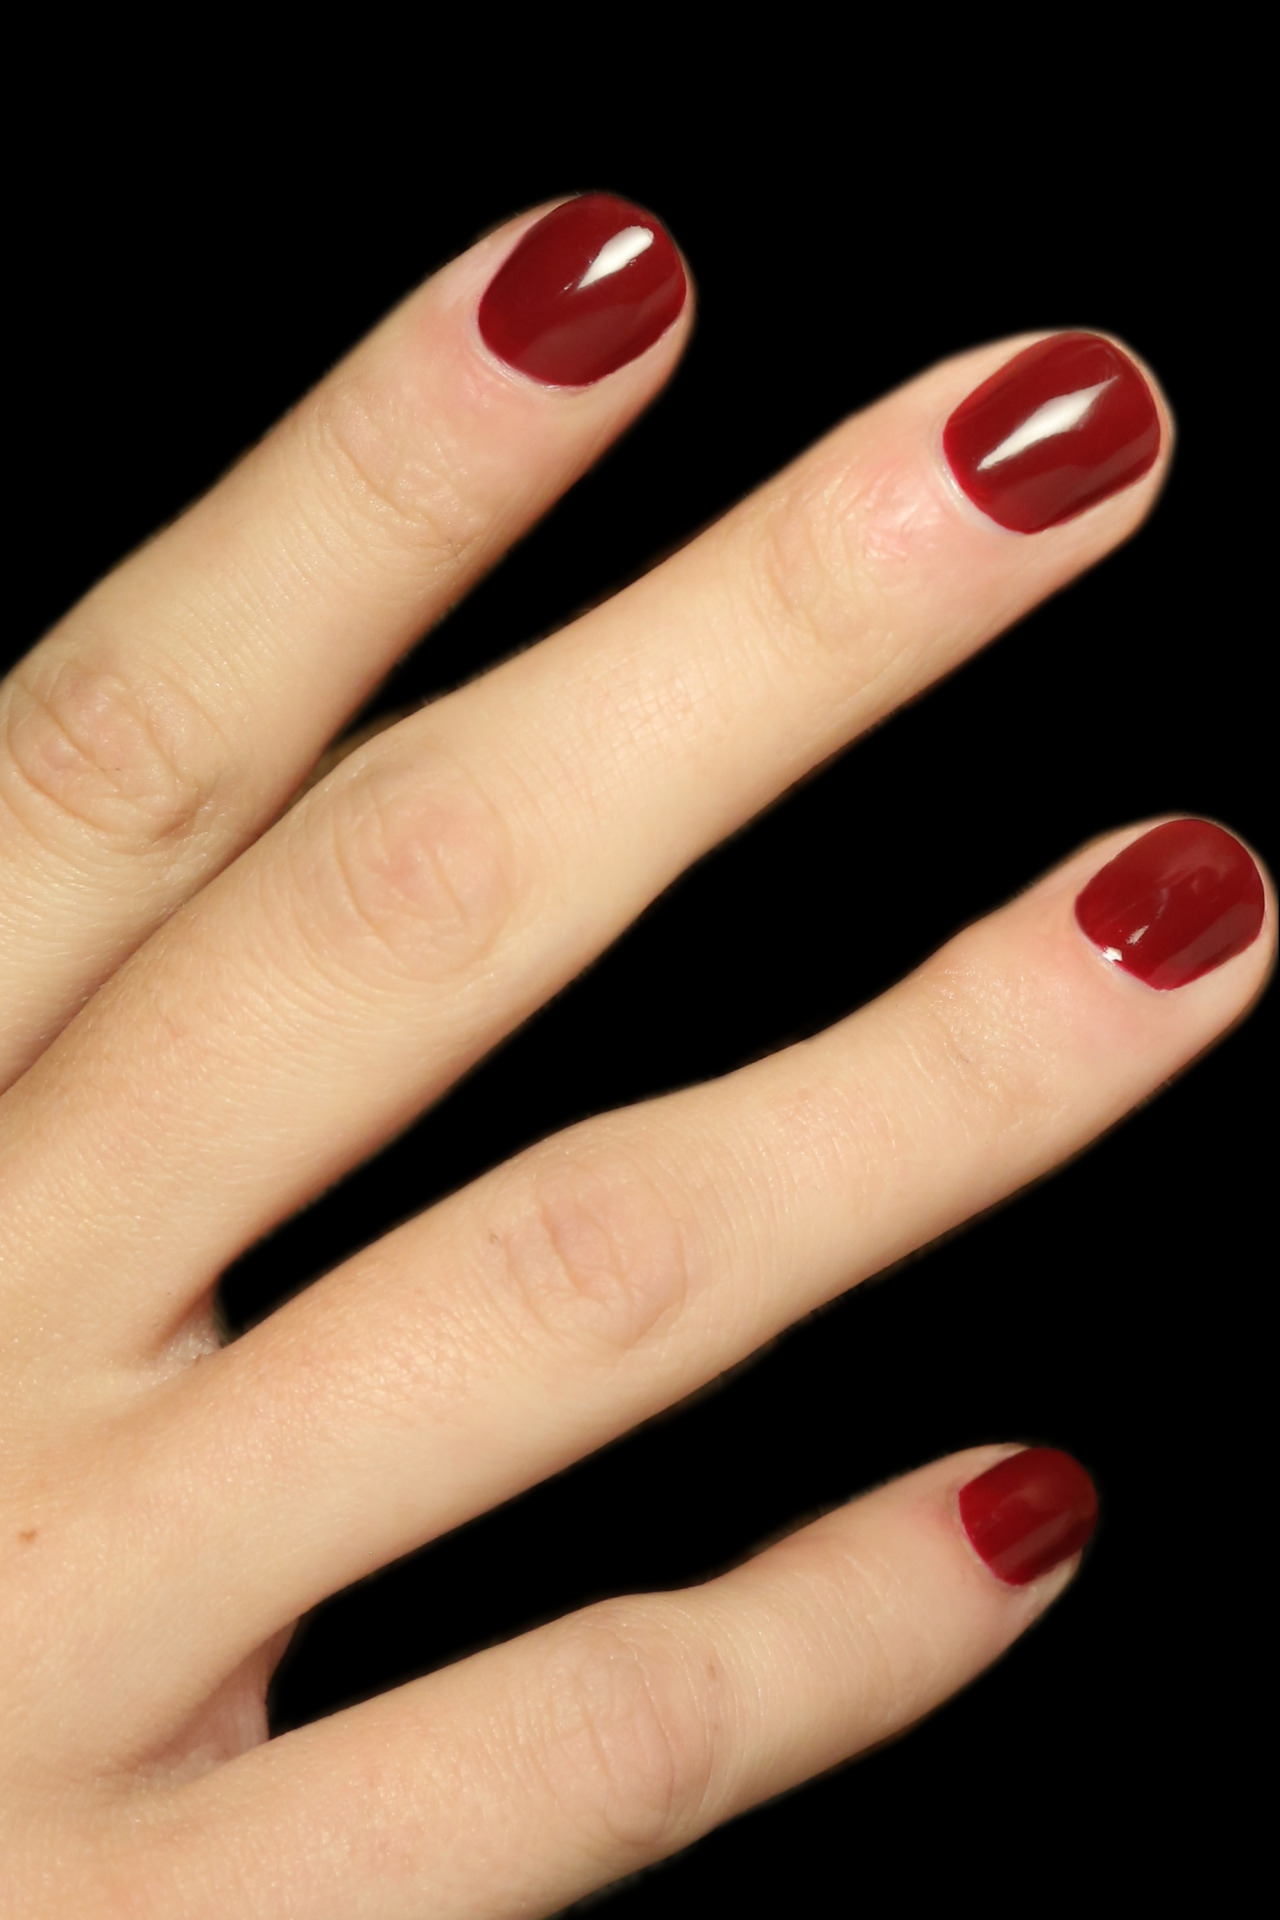 Best Red Nail Polish For Fair Skin : polish, Makeup, Trending, Polish, Shade, To...